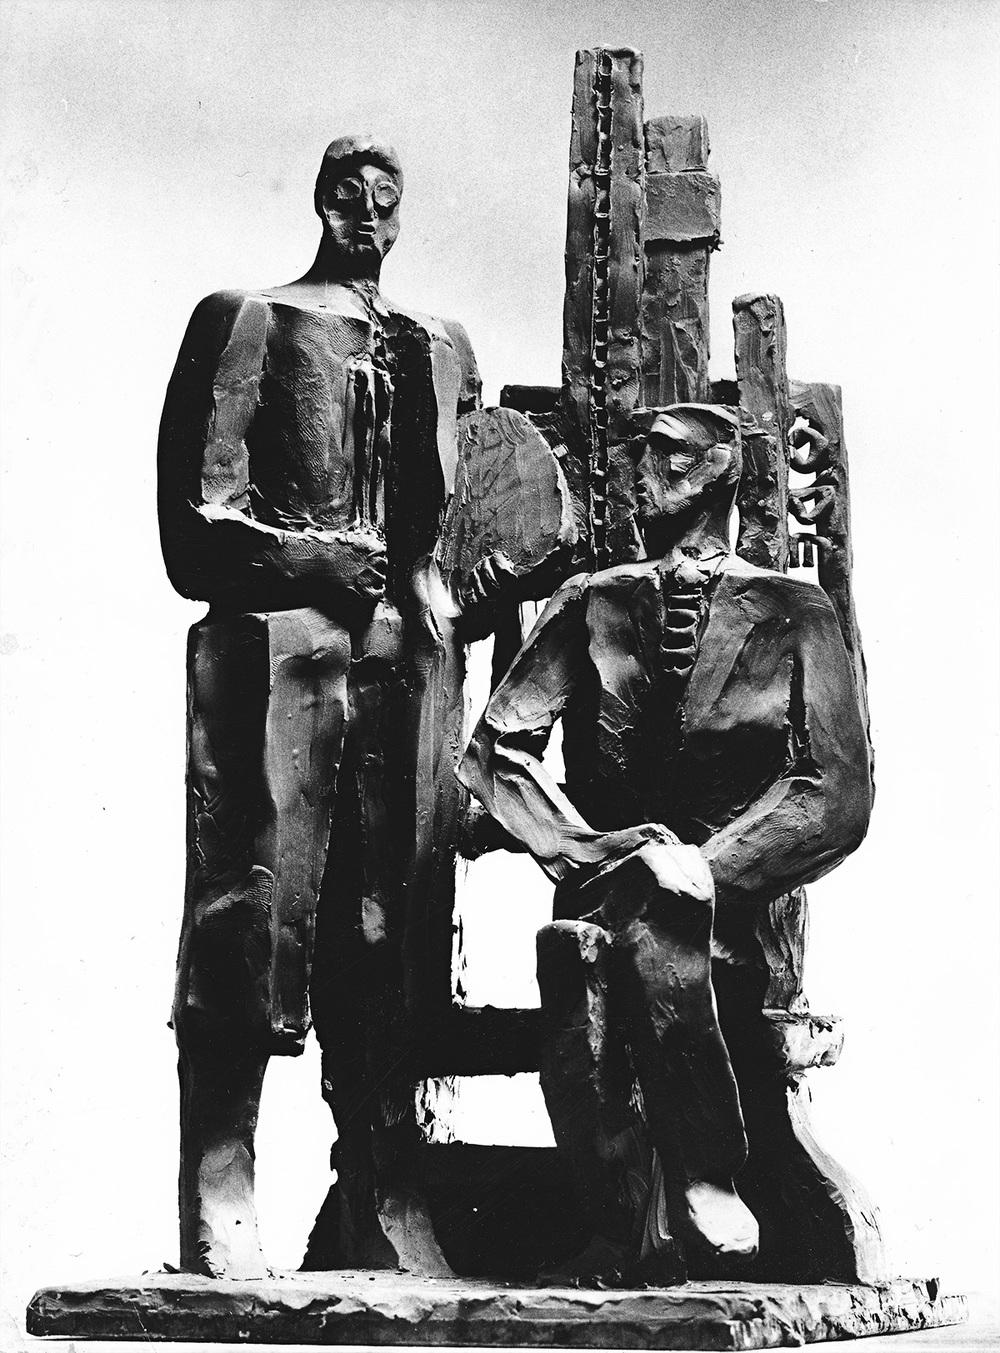 Čapek brothers